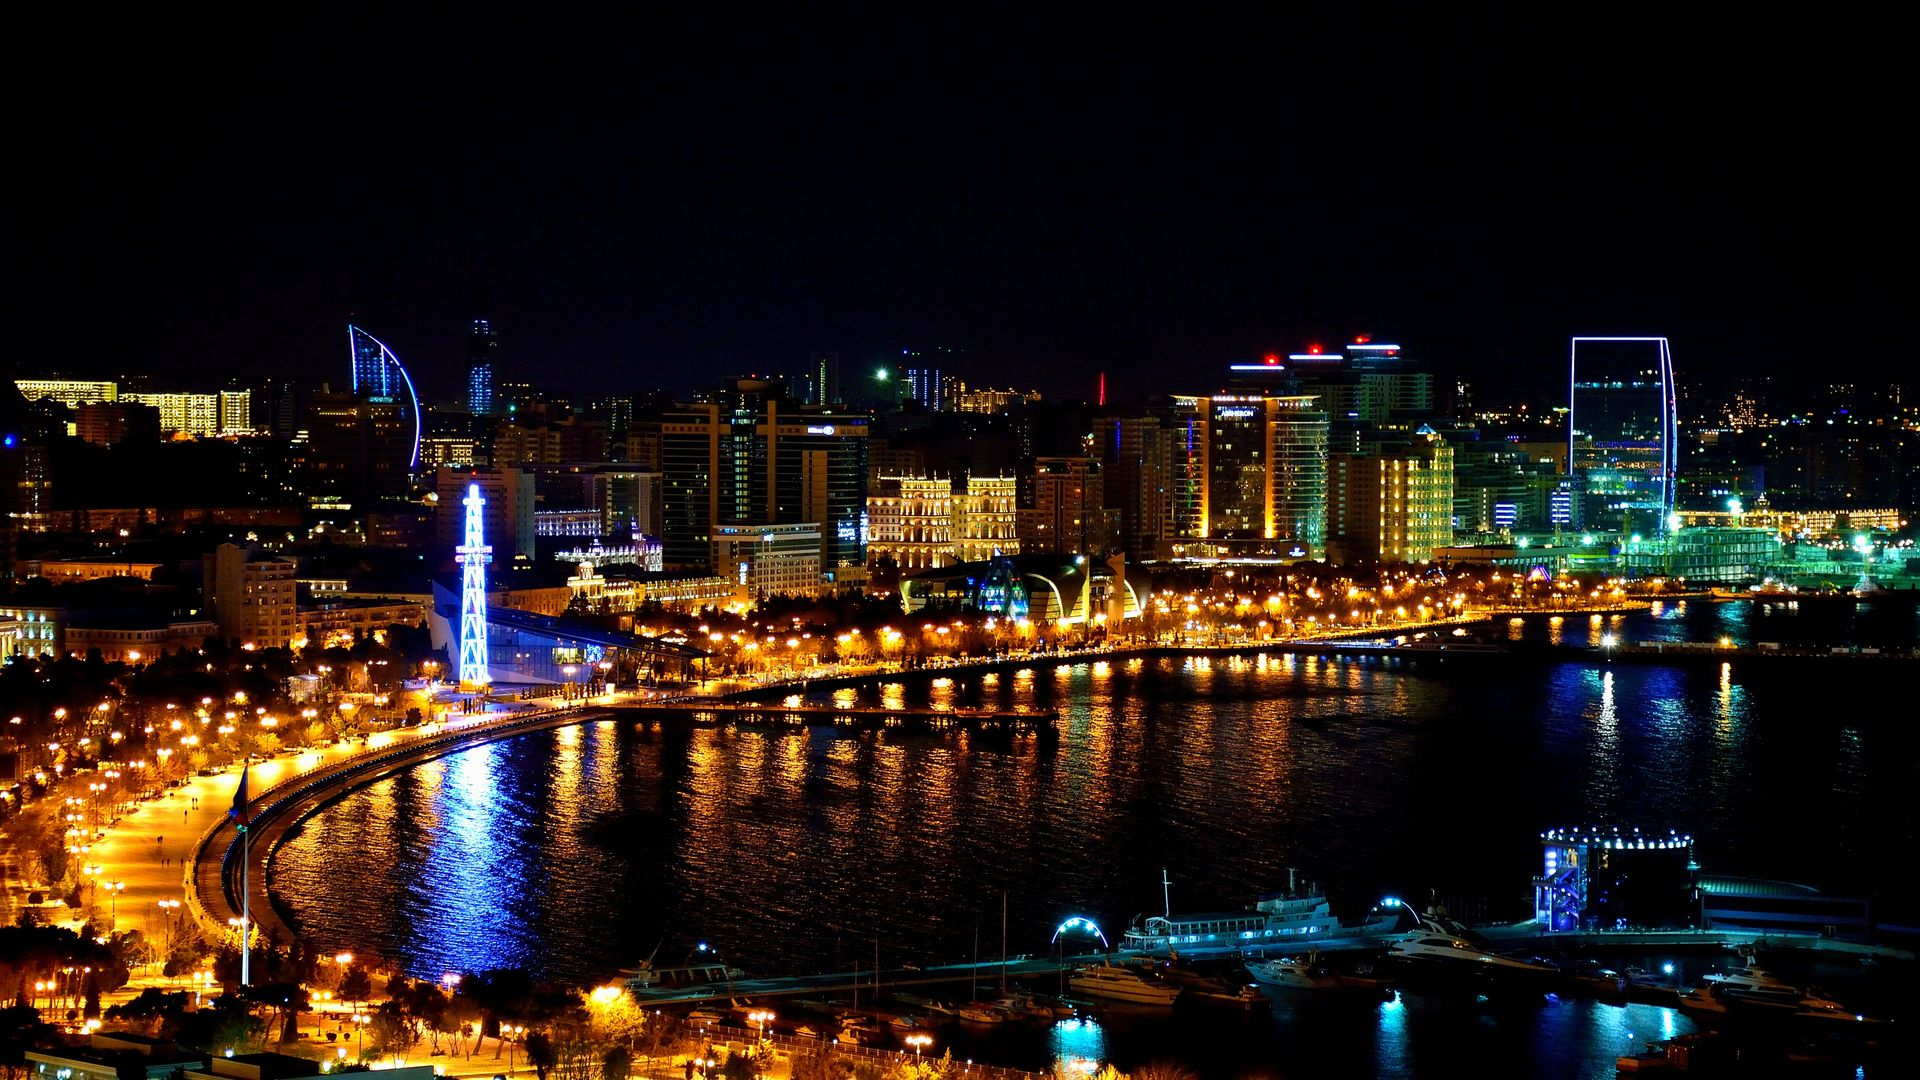 Night City View of Azerbaijan Baku Wallpaper   Wallpaper Stream 1920x1080